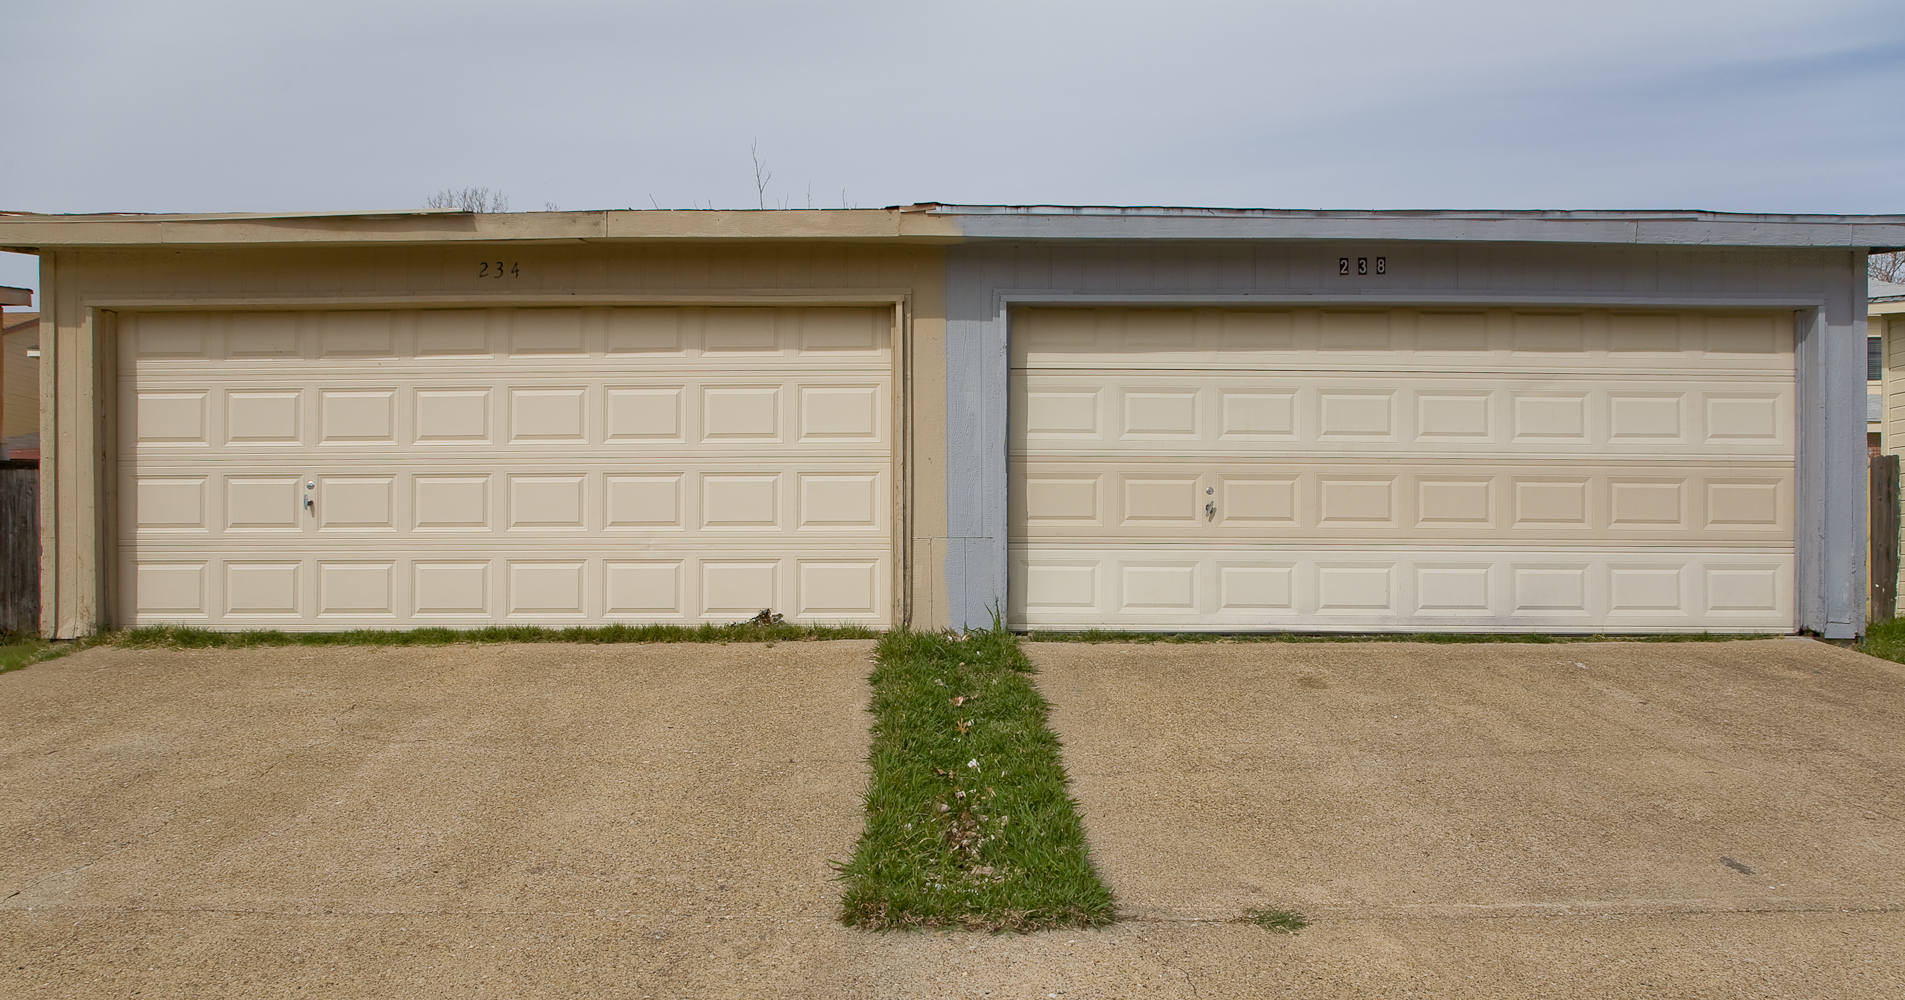 Duplex Homes 2 (8 of 9).jpg